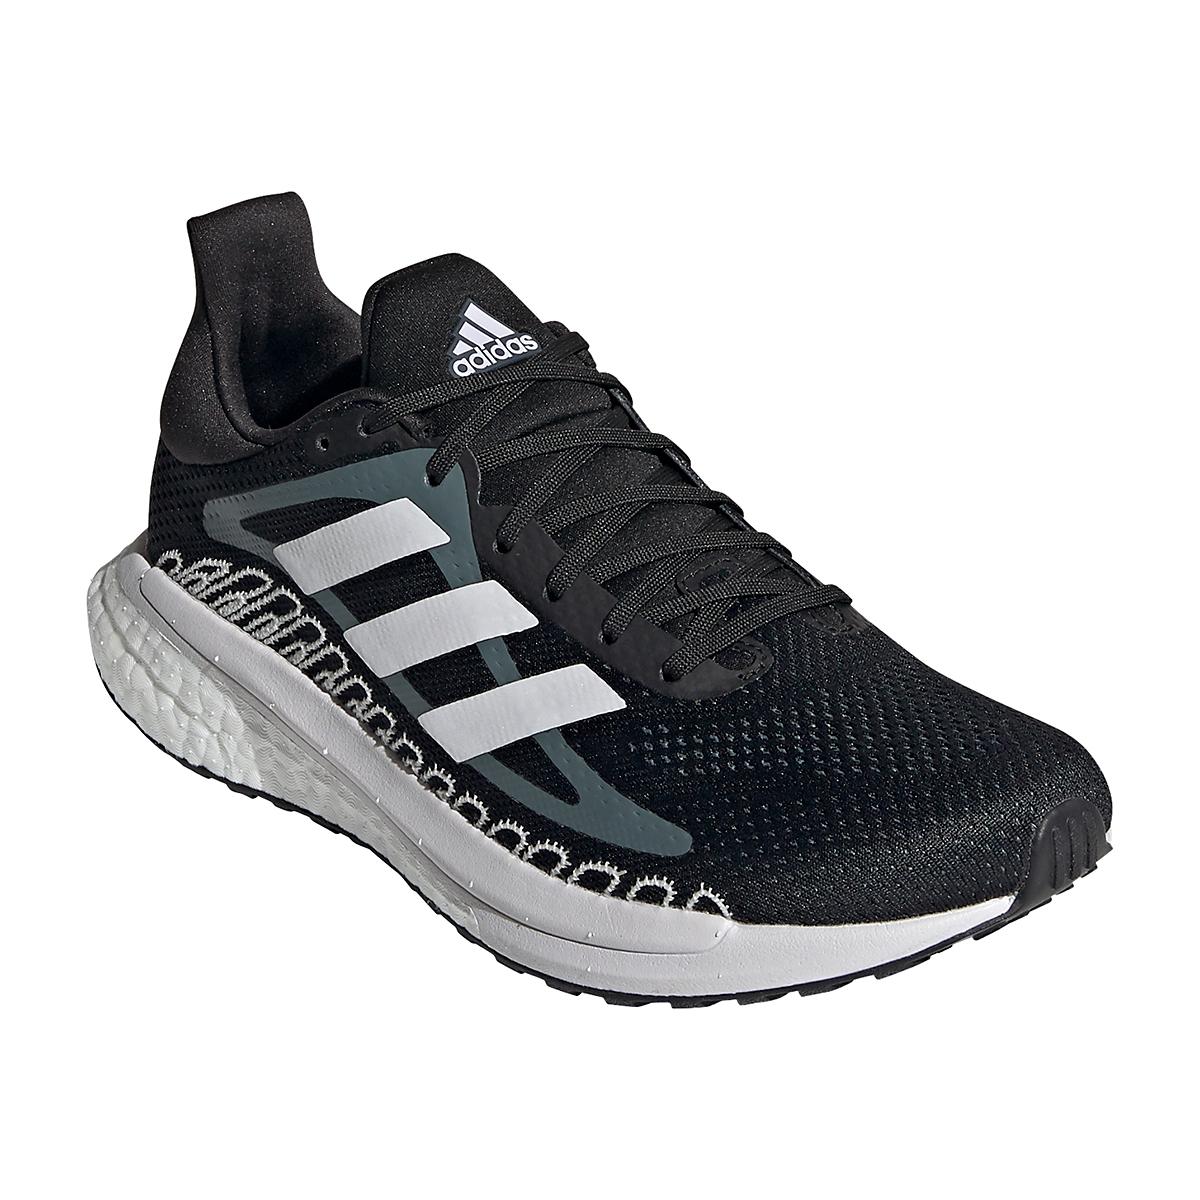 Women's Adidas Solar Glide ST 3 Running Shoe - Color: Core Black - Size: 5 - Width: Regular, Core Black, large, image 3